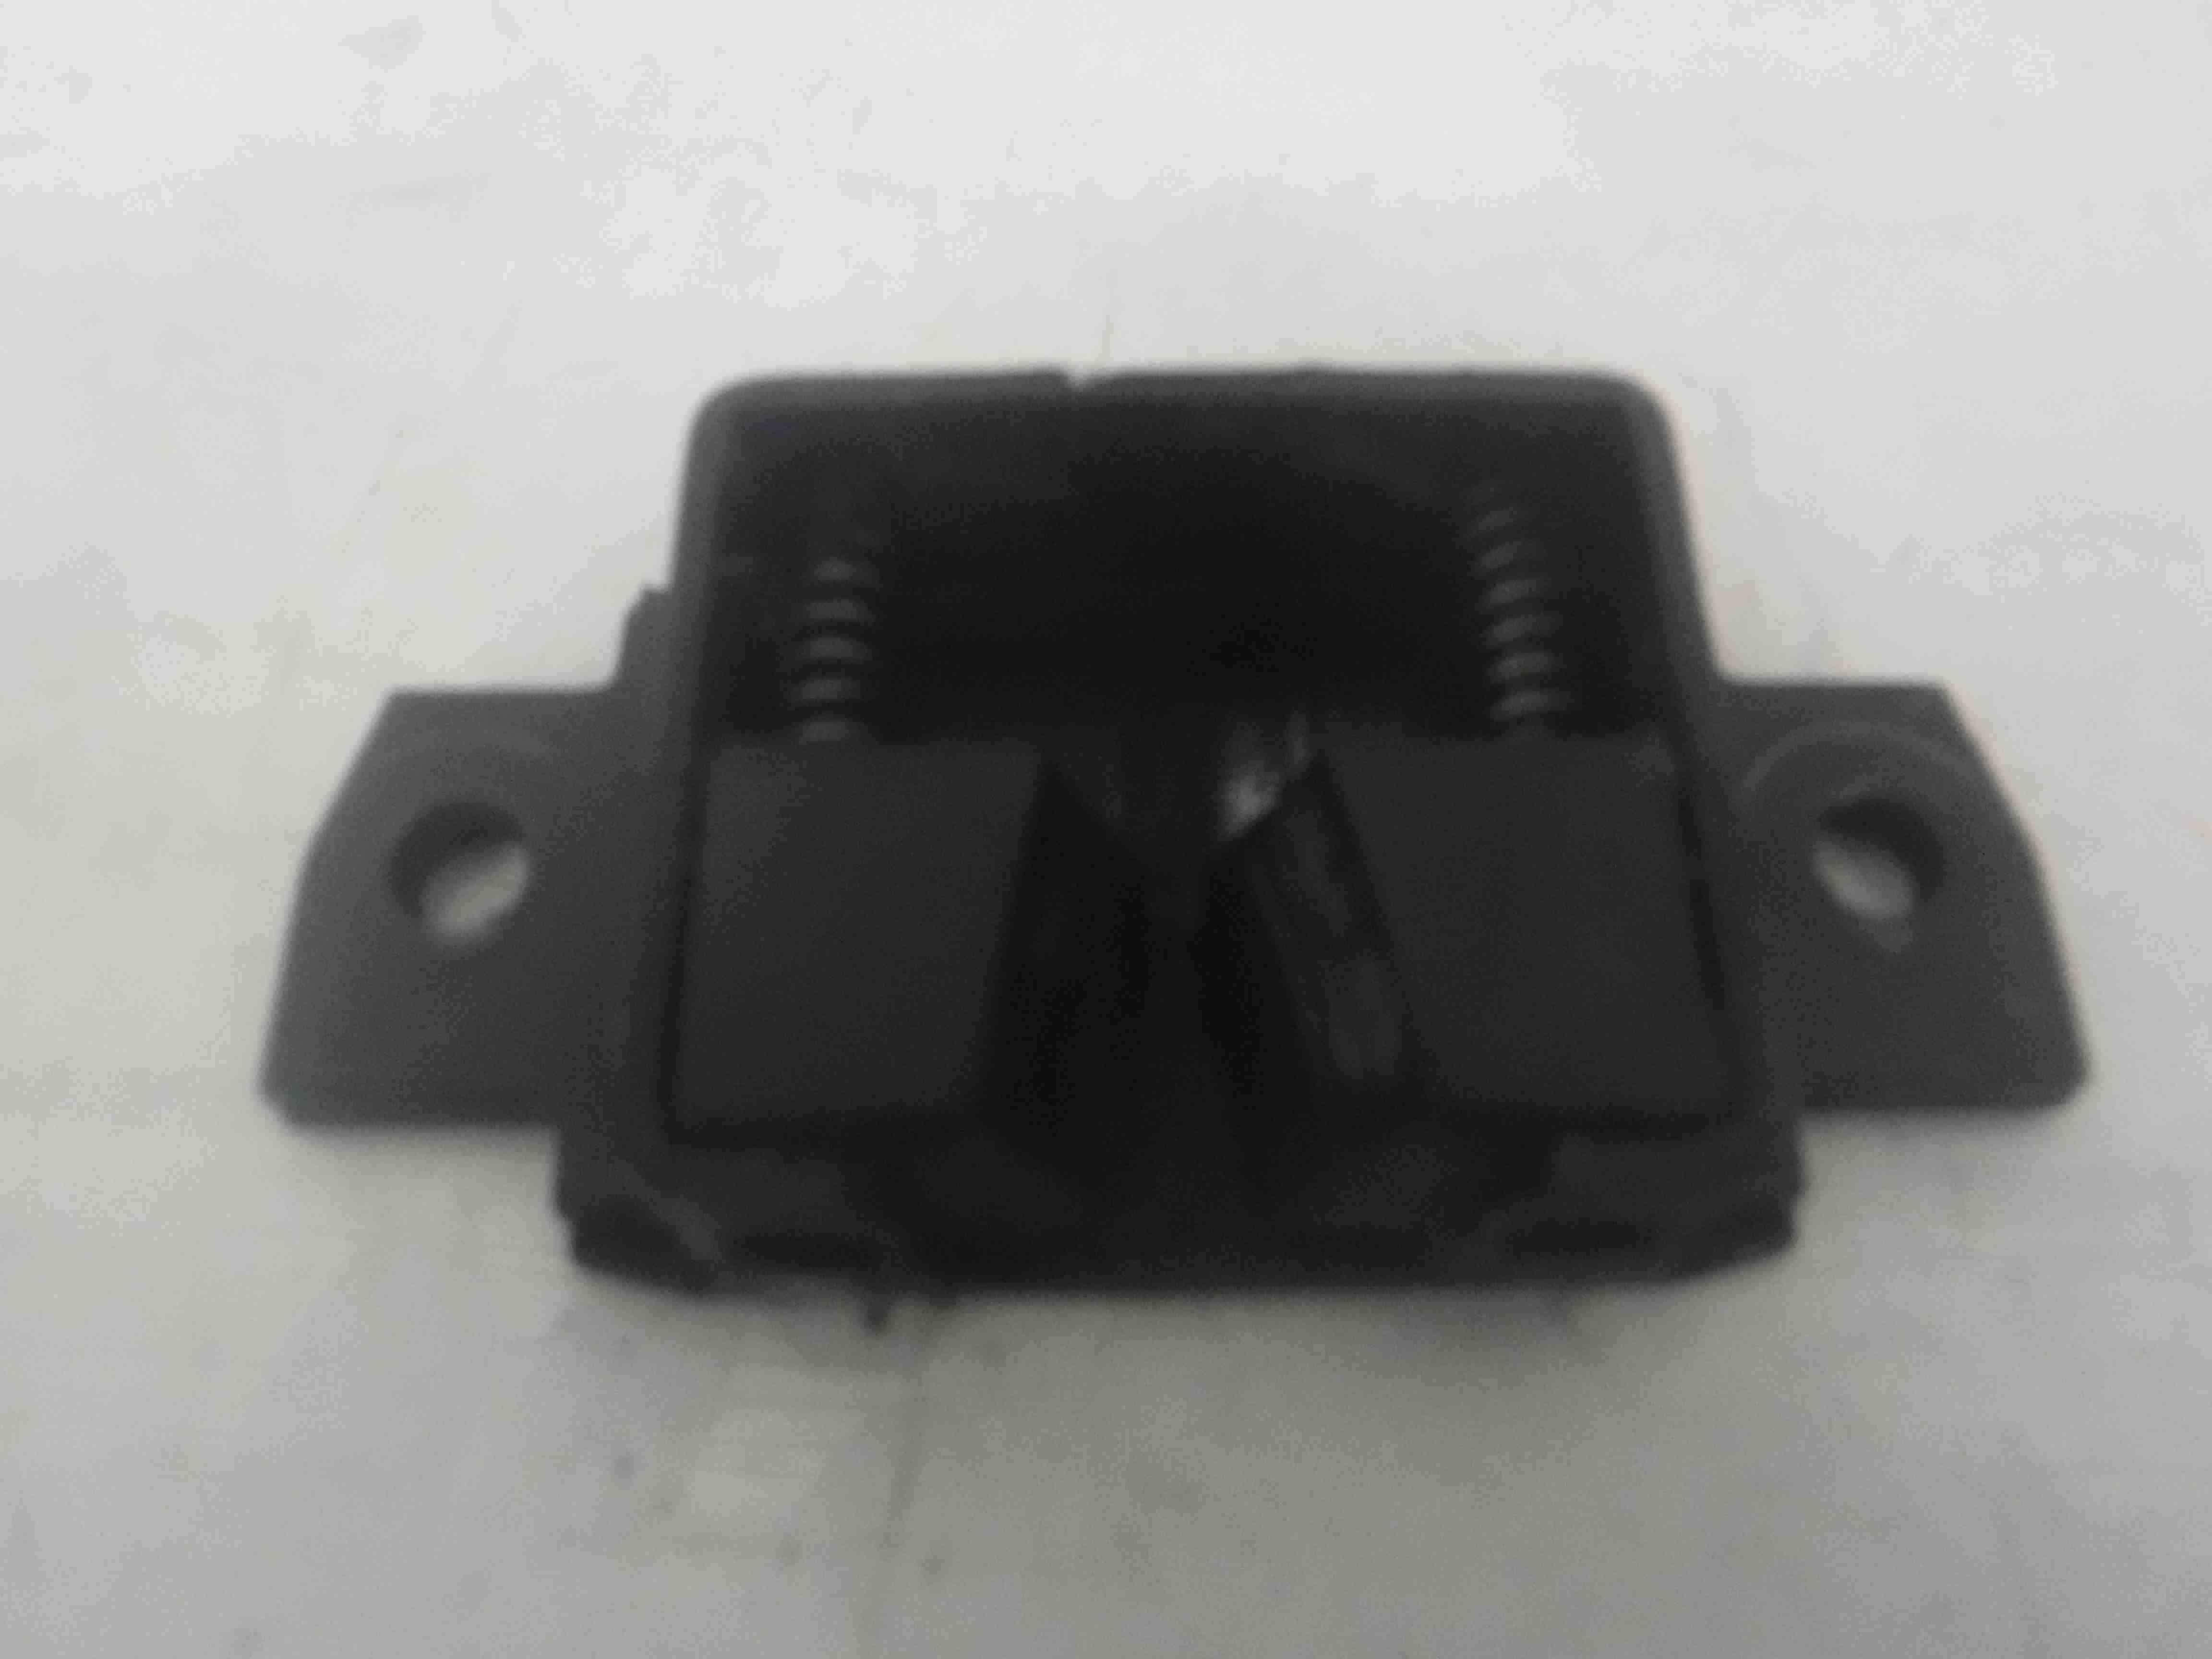 Volkswagen Sharan 2000-2003 Rear Boot Lock Catch Mechanism Spring Clip